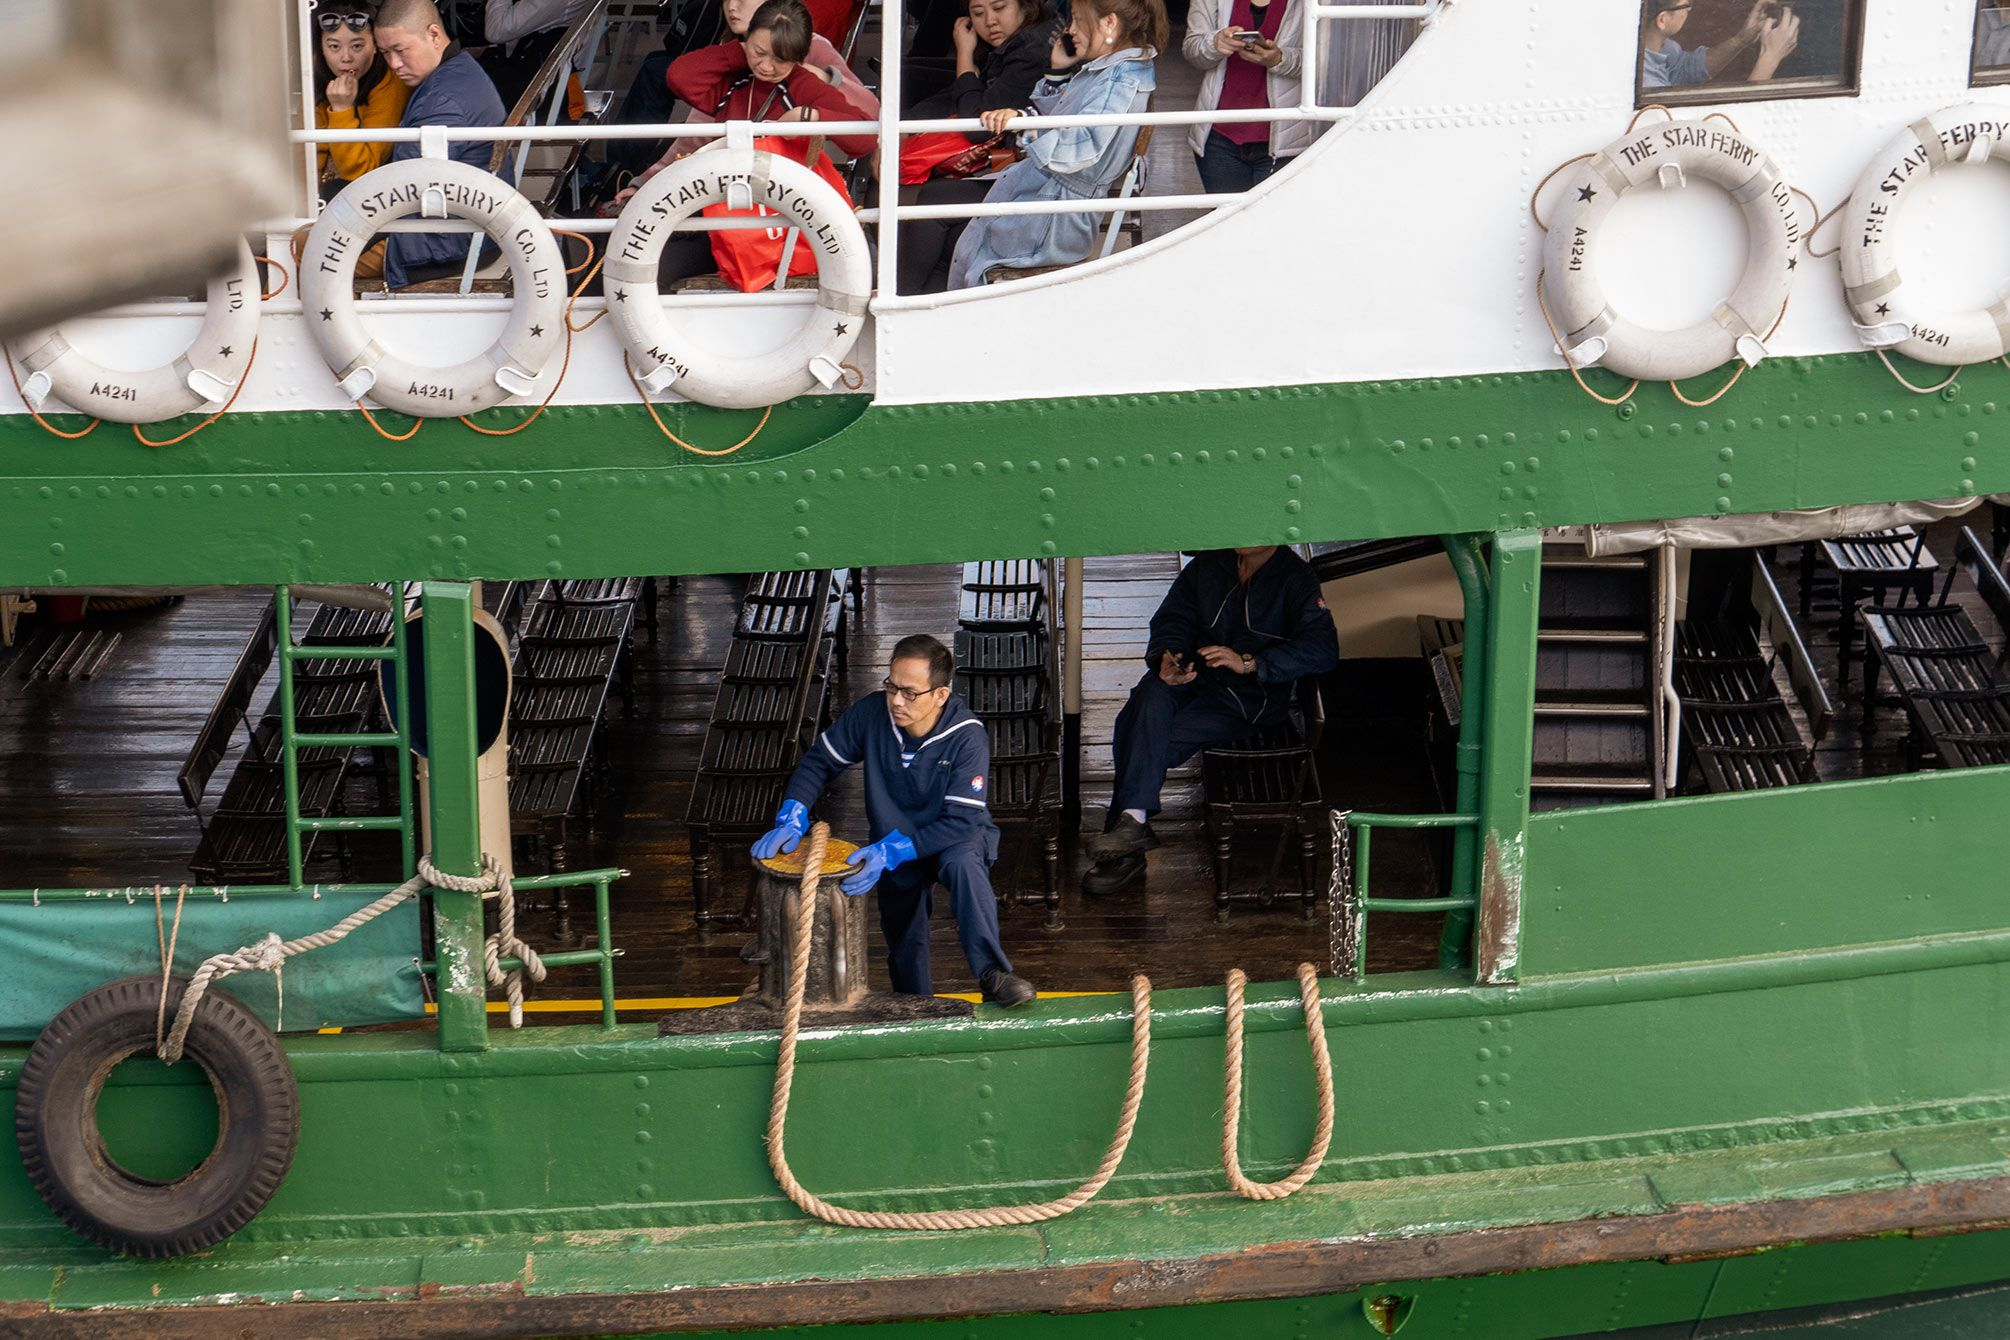 star ferry Mooring